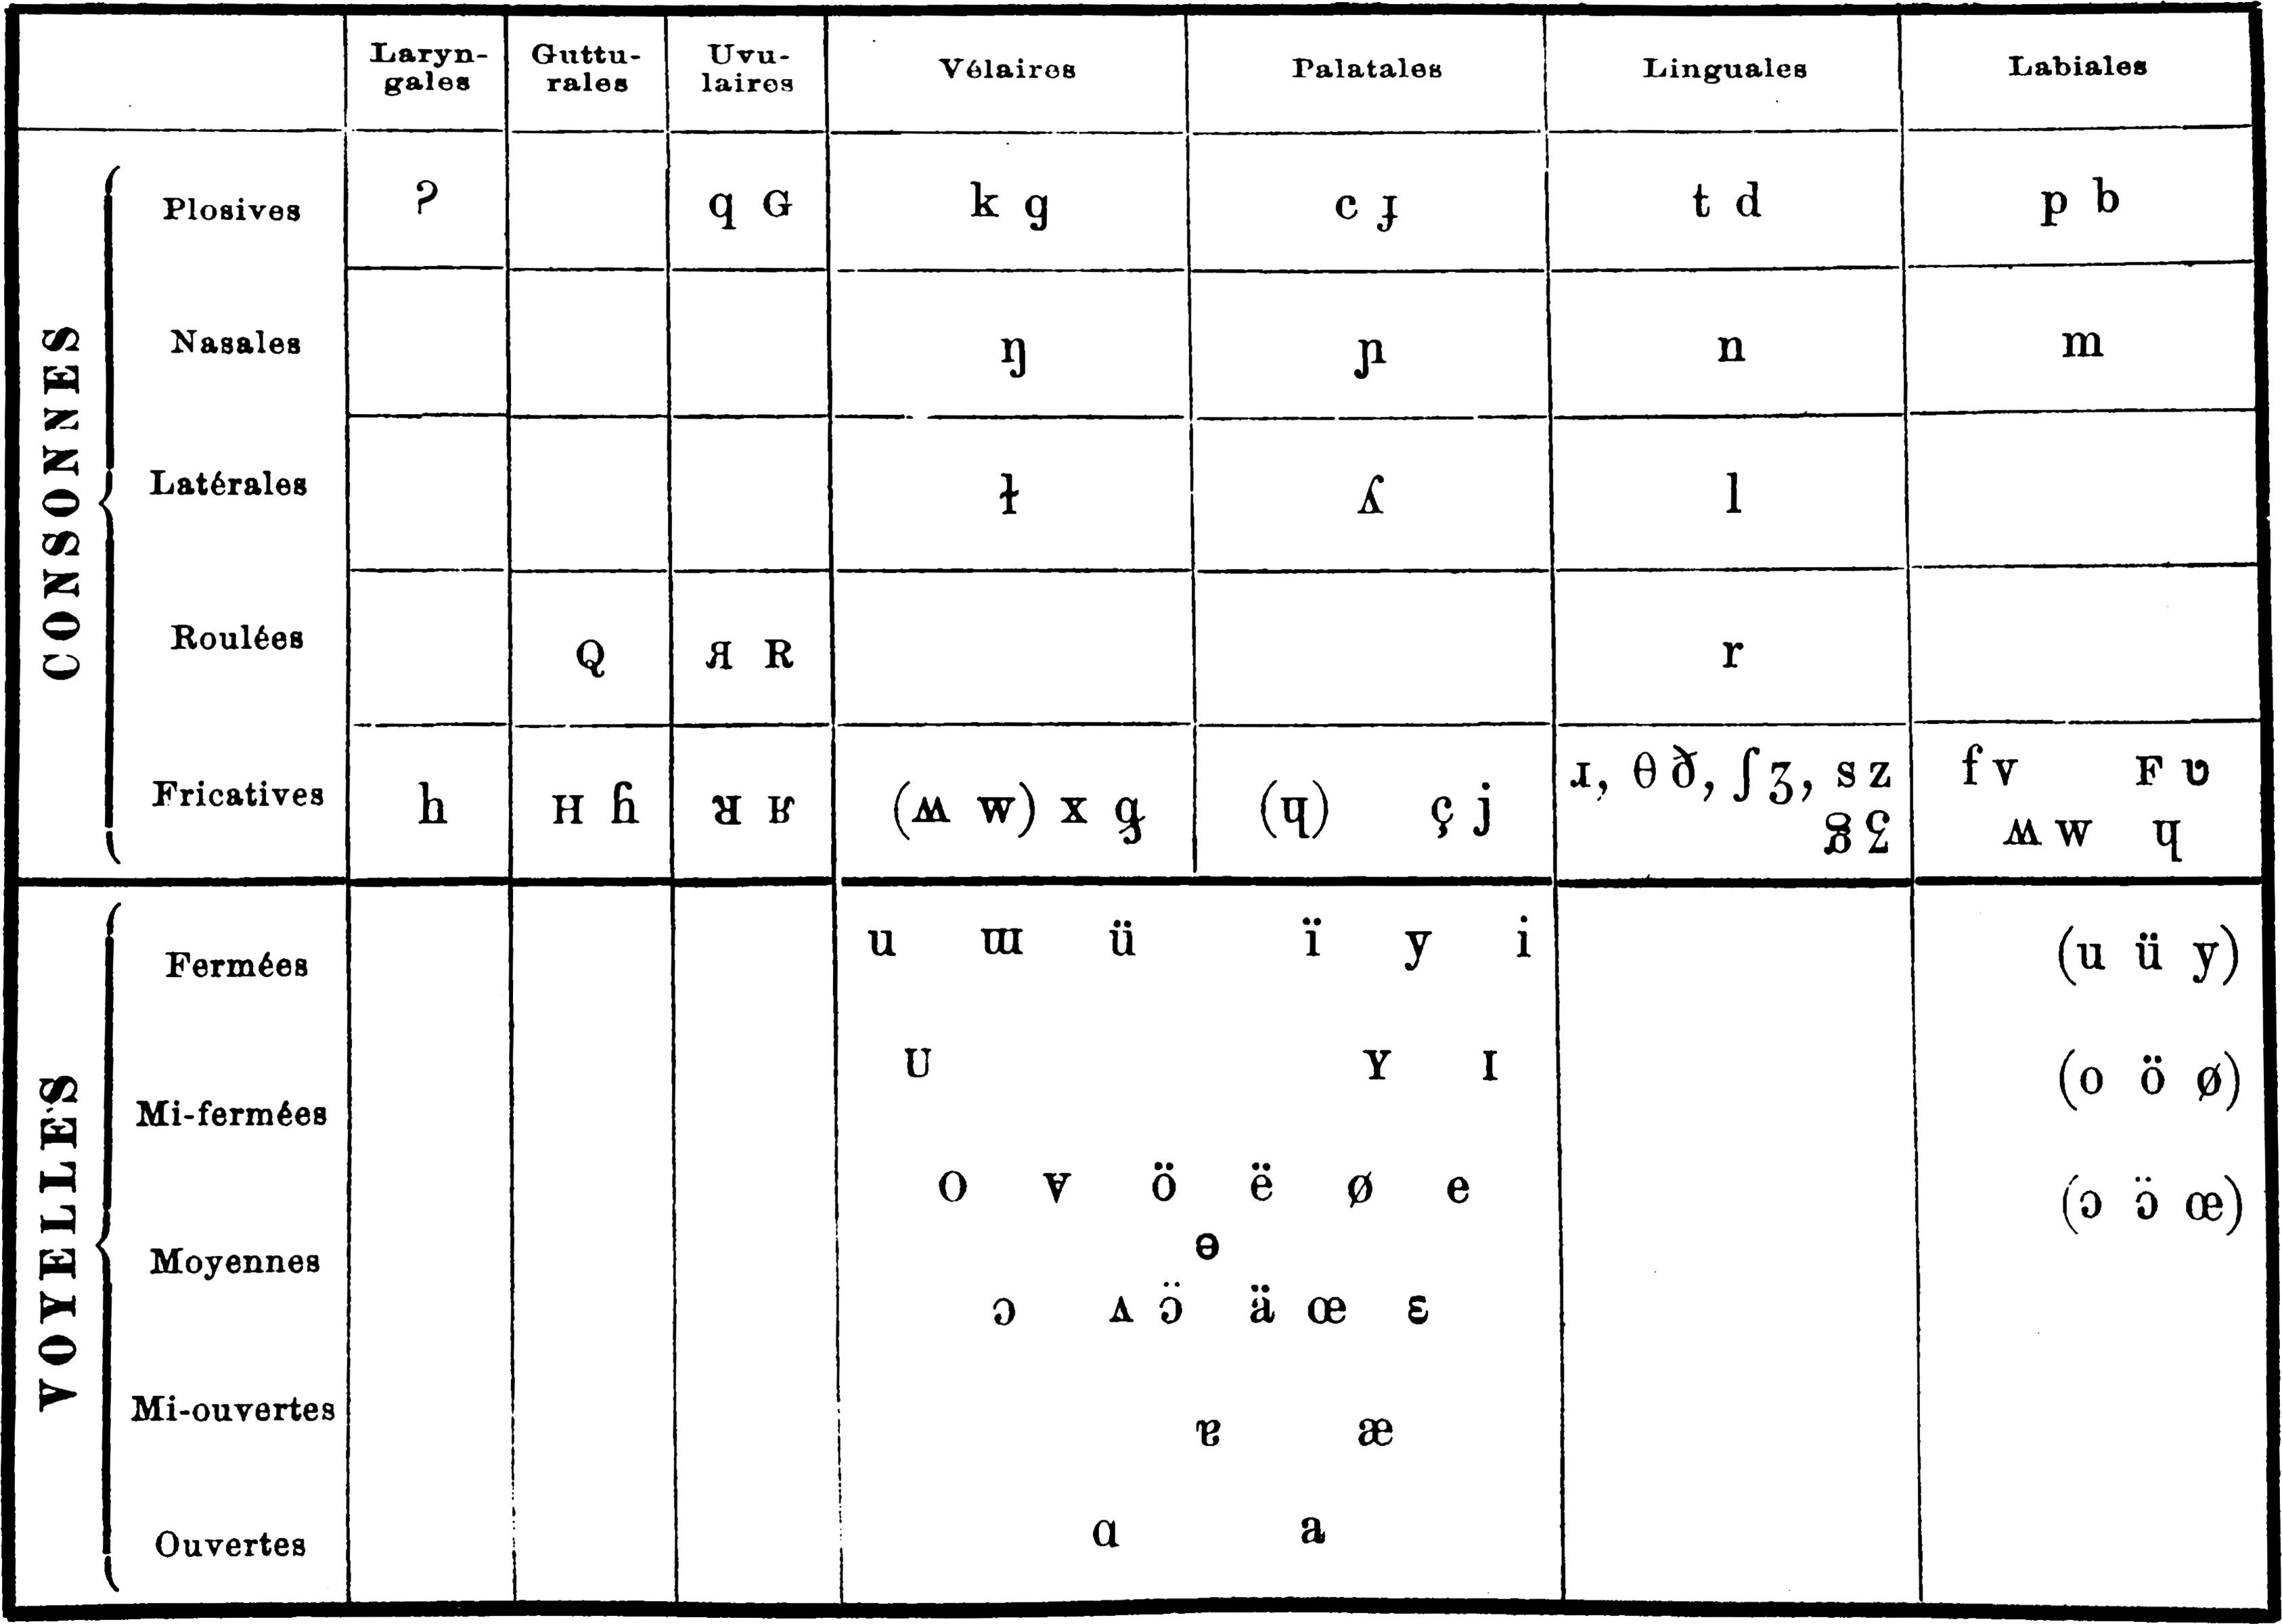 Ipa Historical Charts